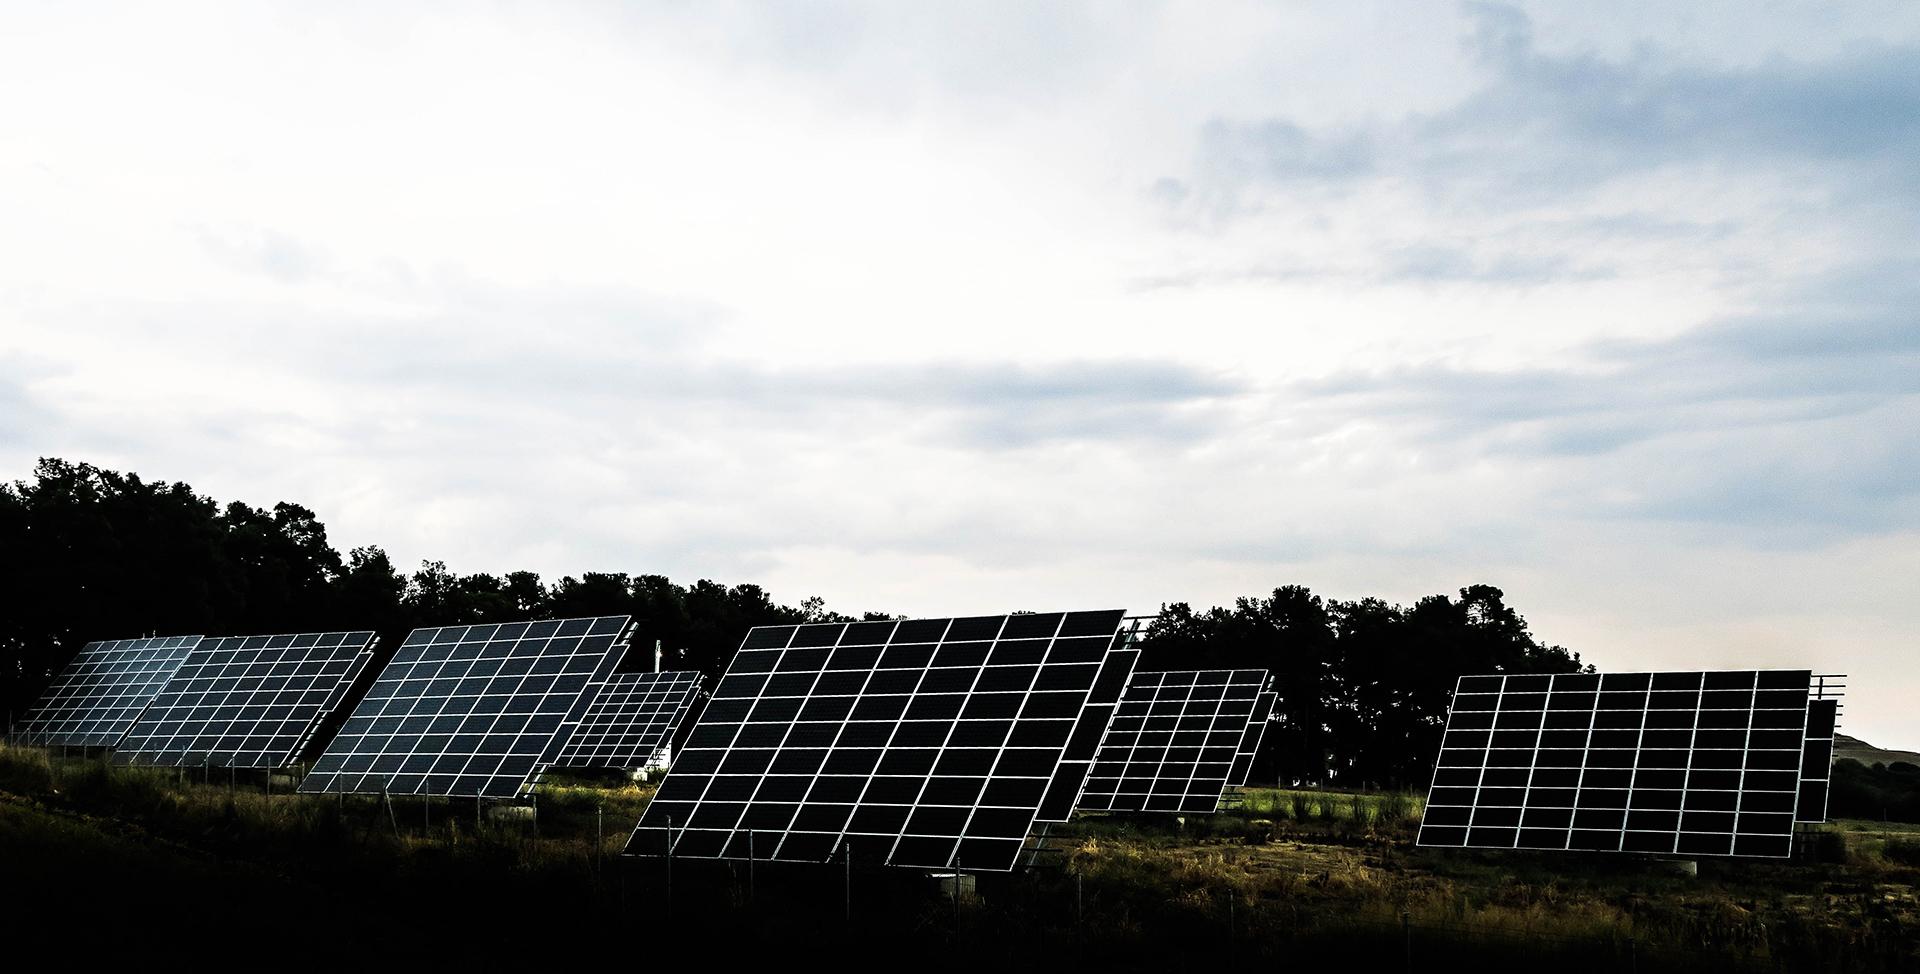 Solar panel photograph